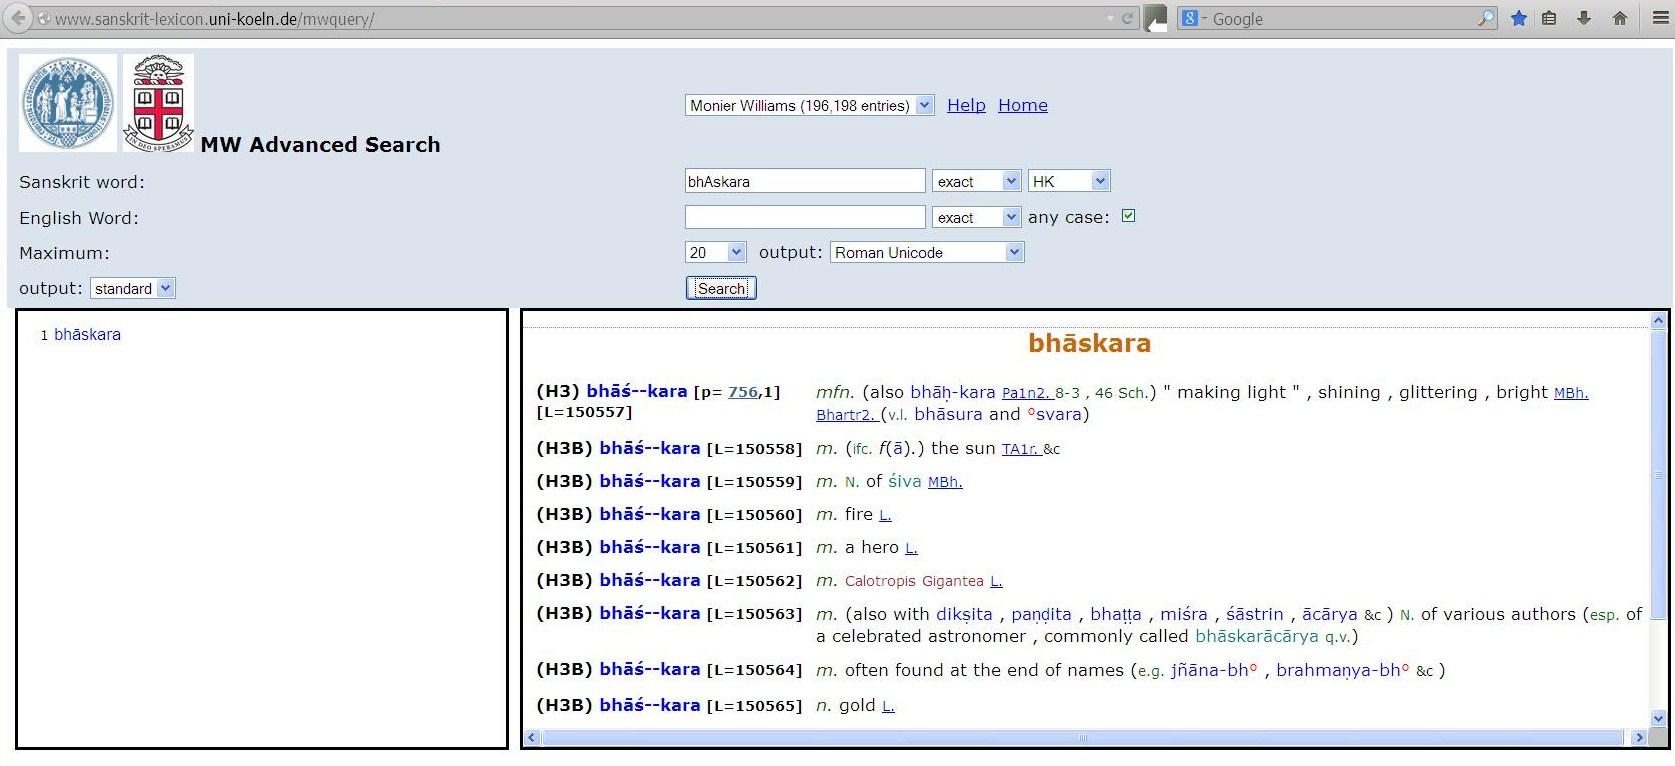 monier williams sanskrit english dictionary